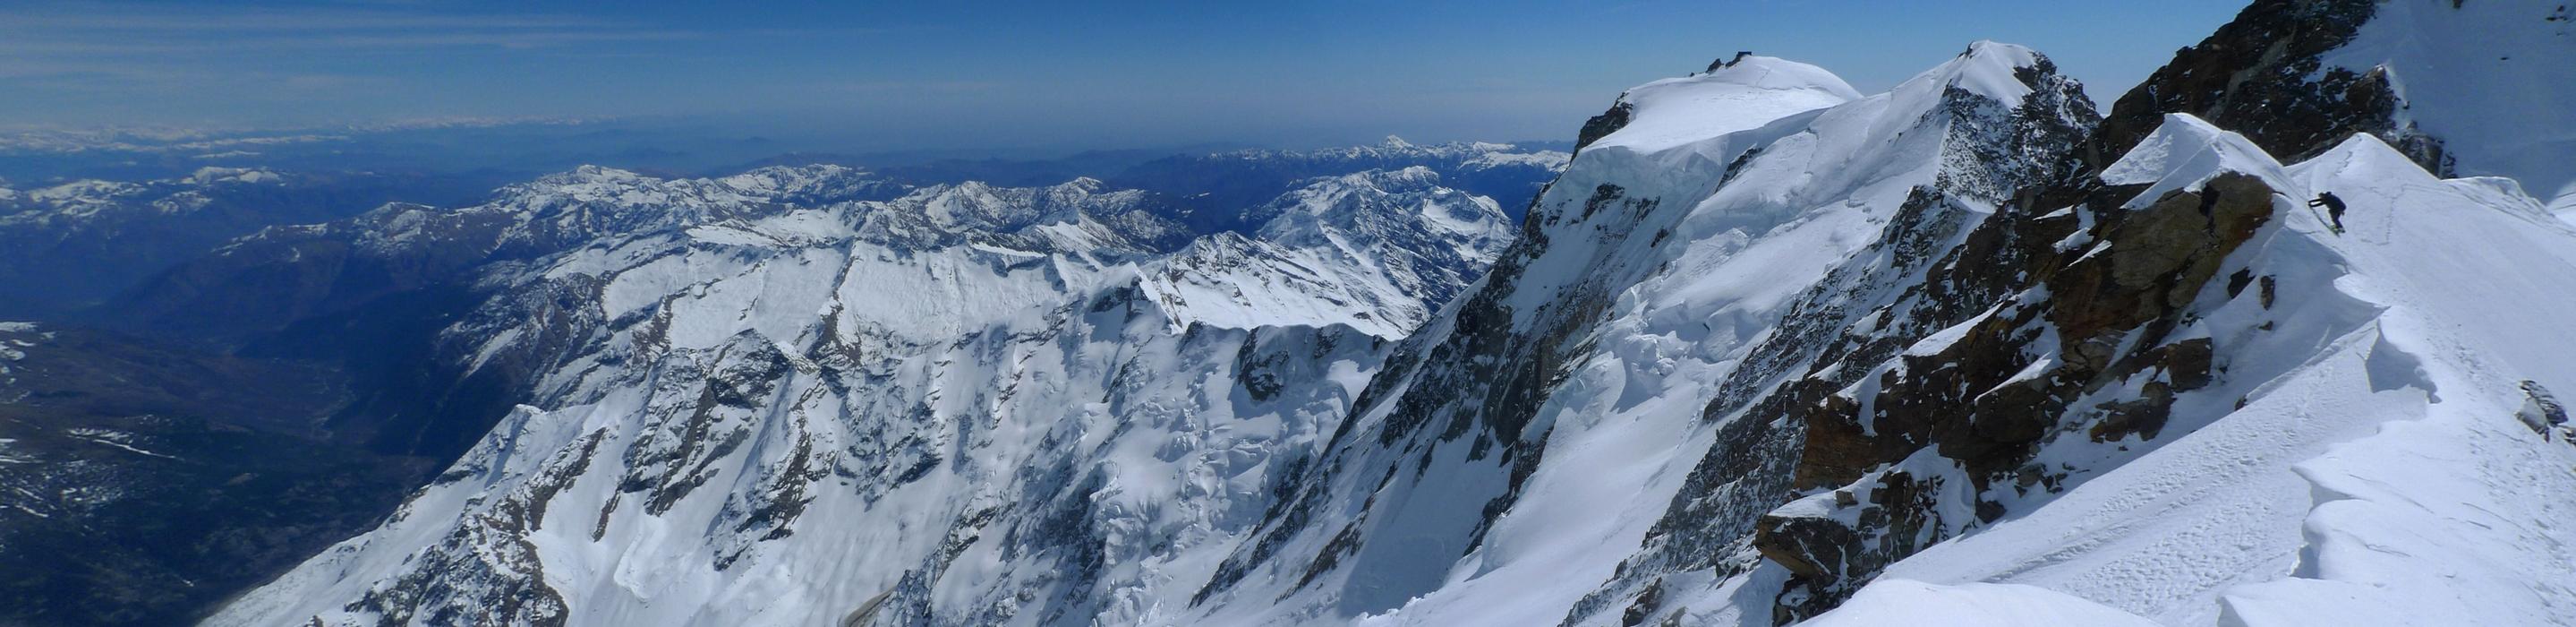 Nordend - Monte Rosa Walliser Alpen / Alpes valaisannes Švýcarsko panorama 37